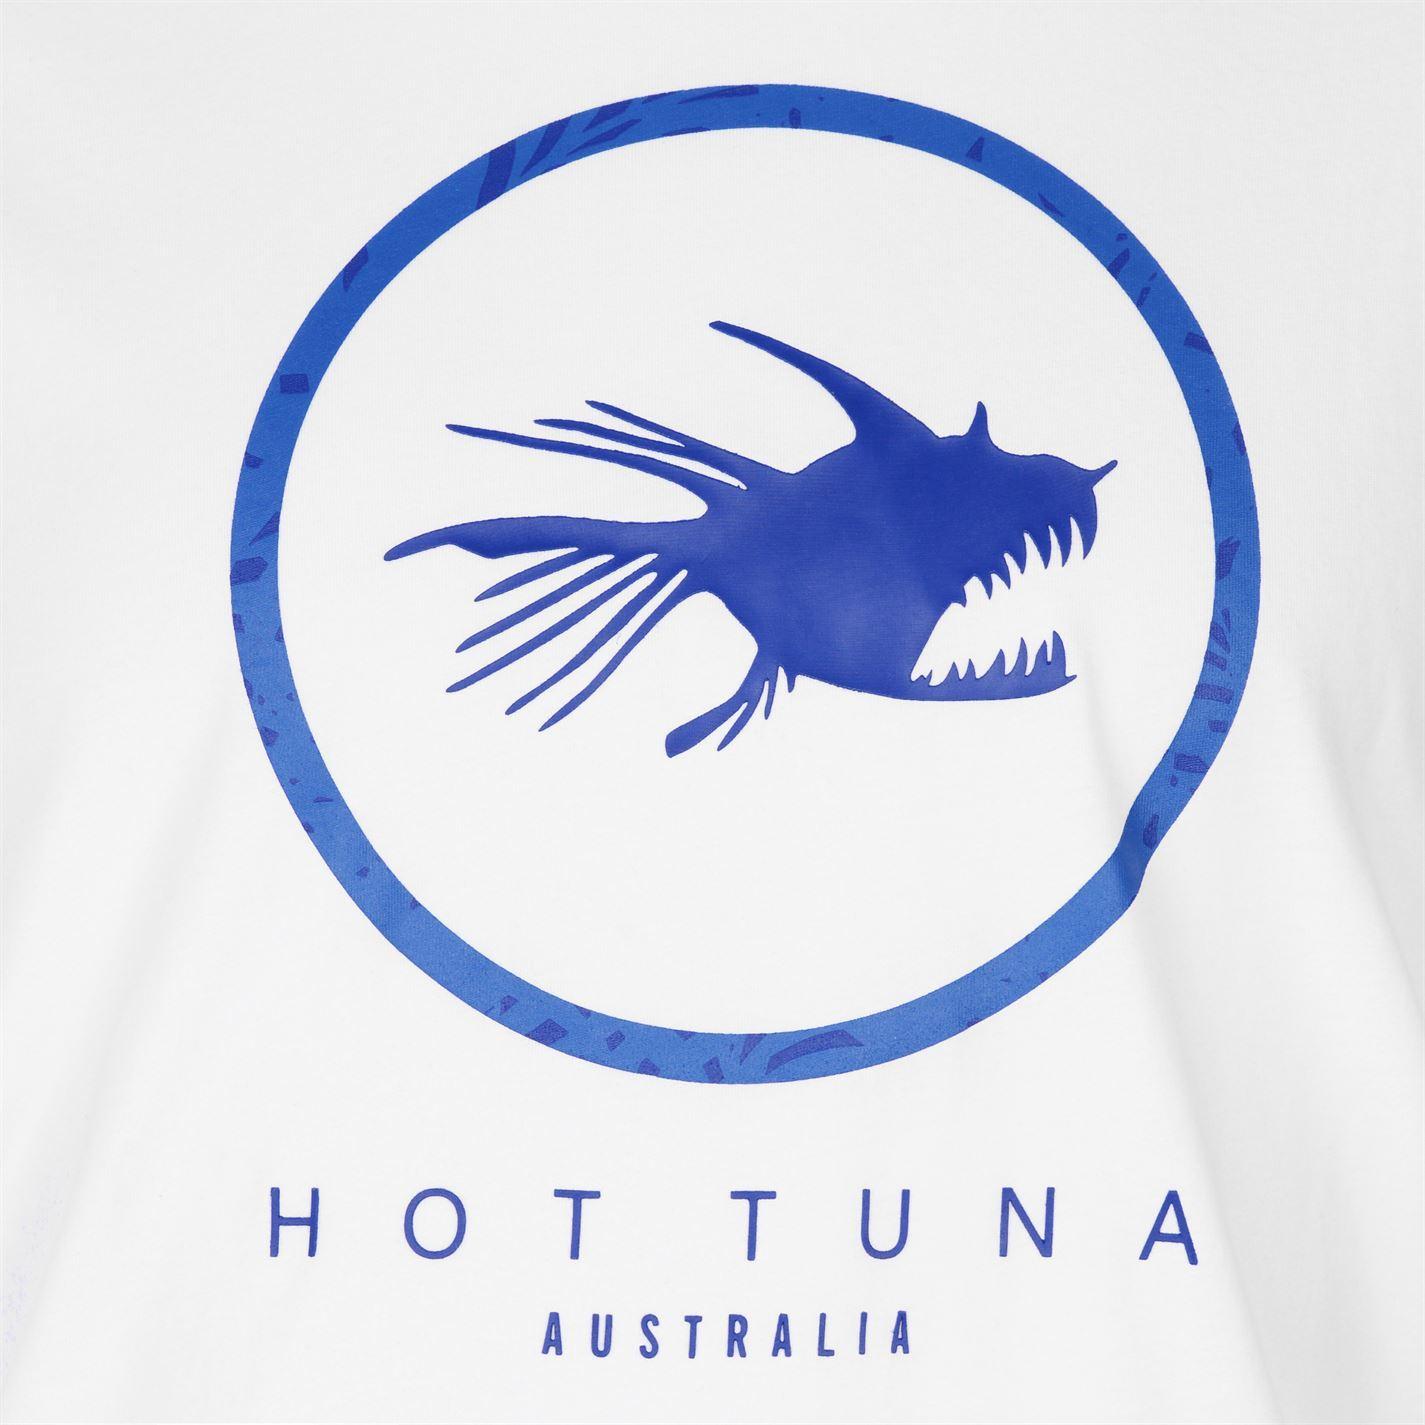 c960770879d Hot Tuna Australia Logo T-Shirt Mens White Tee Shirt Tshirt Top | eBay